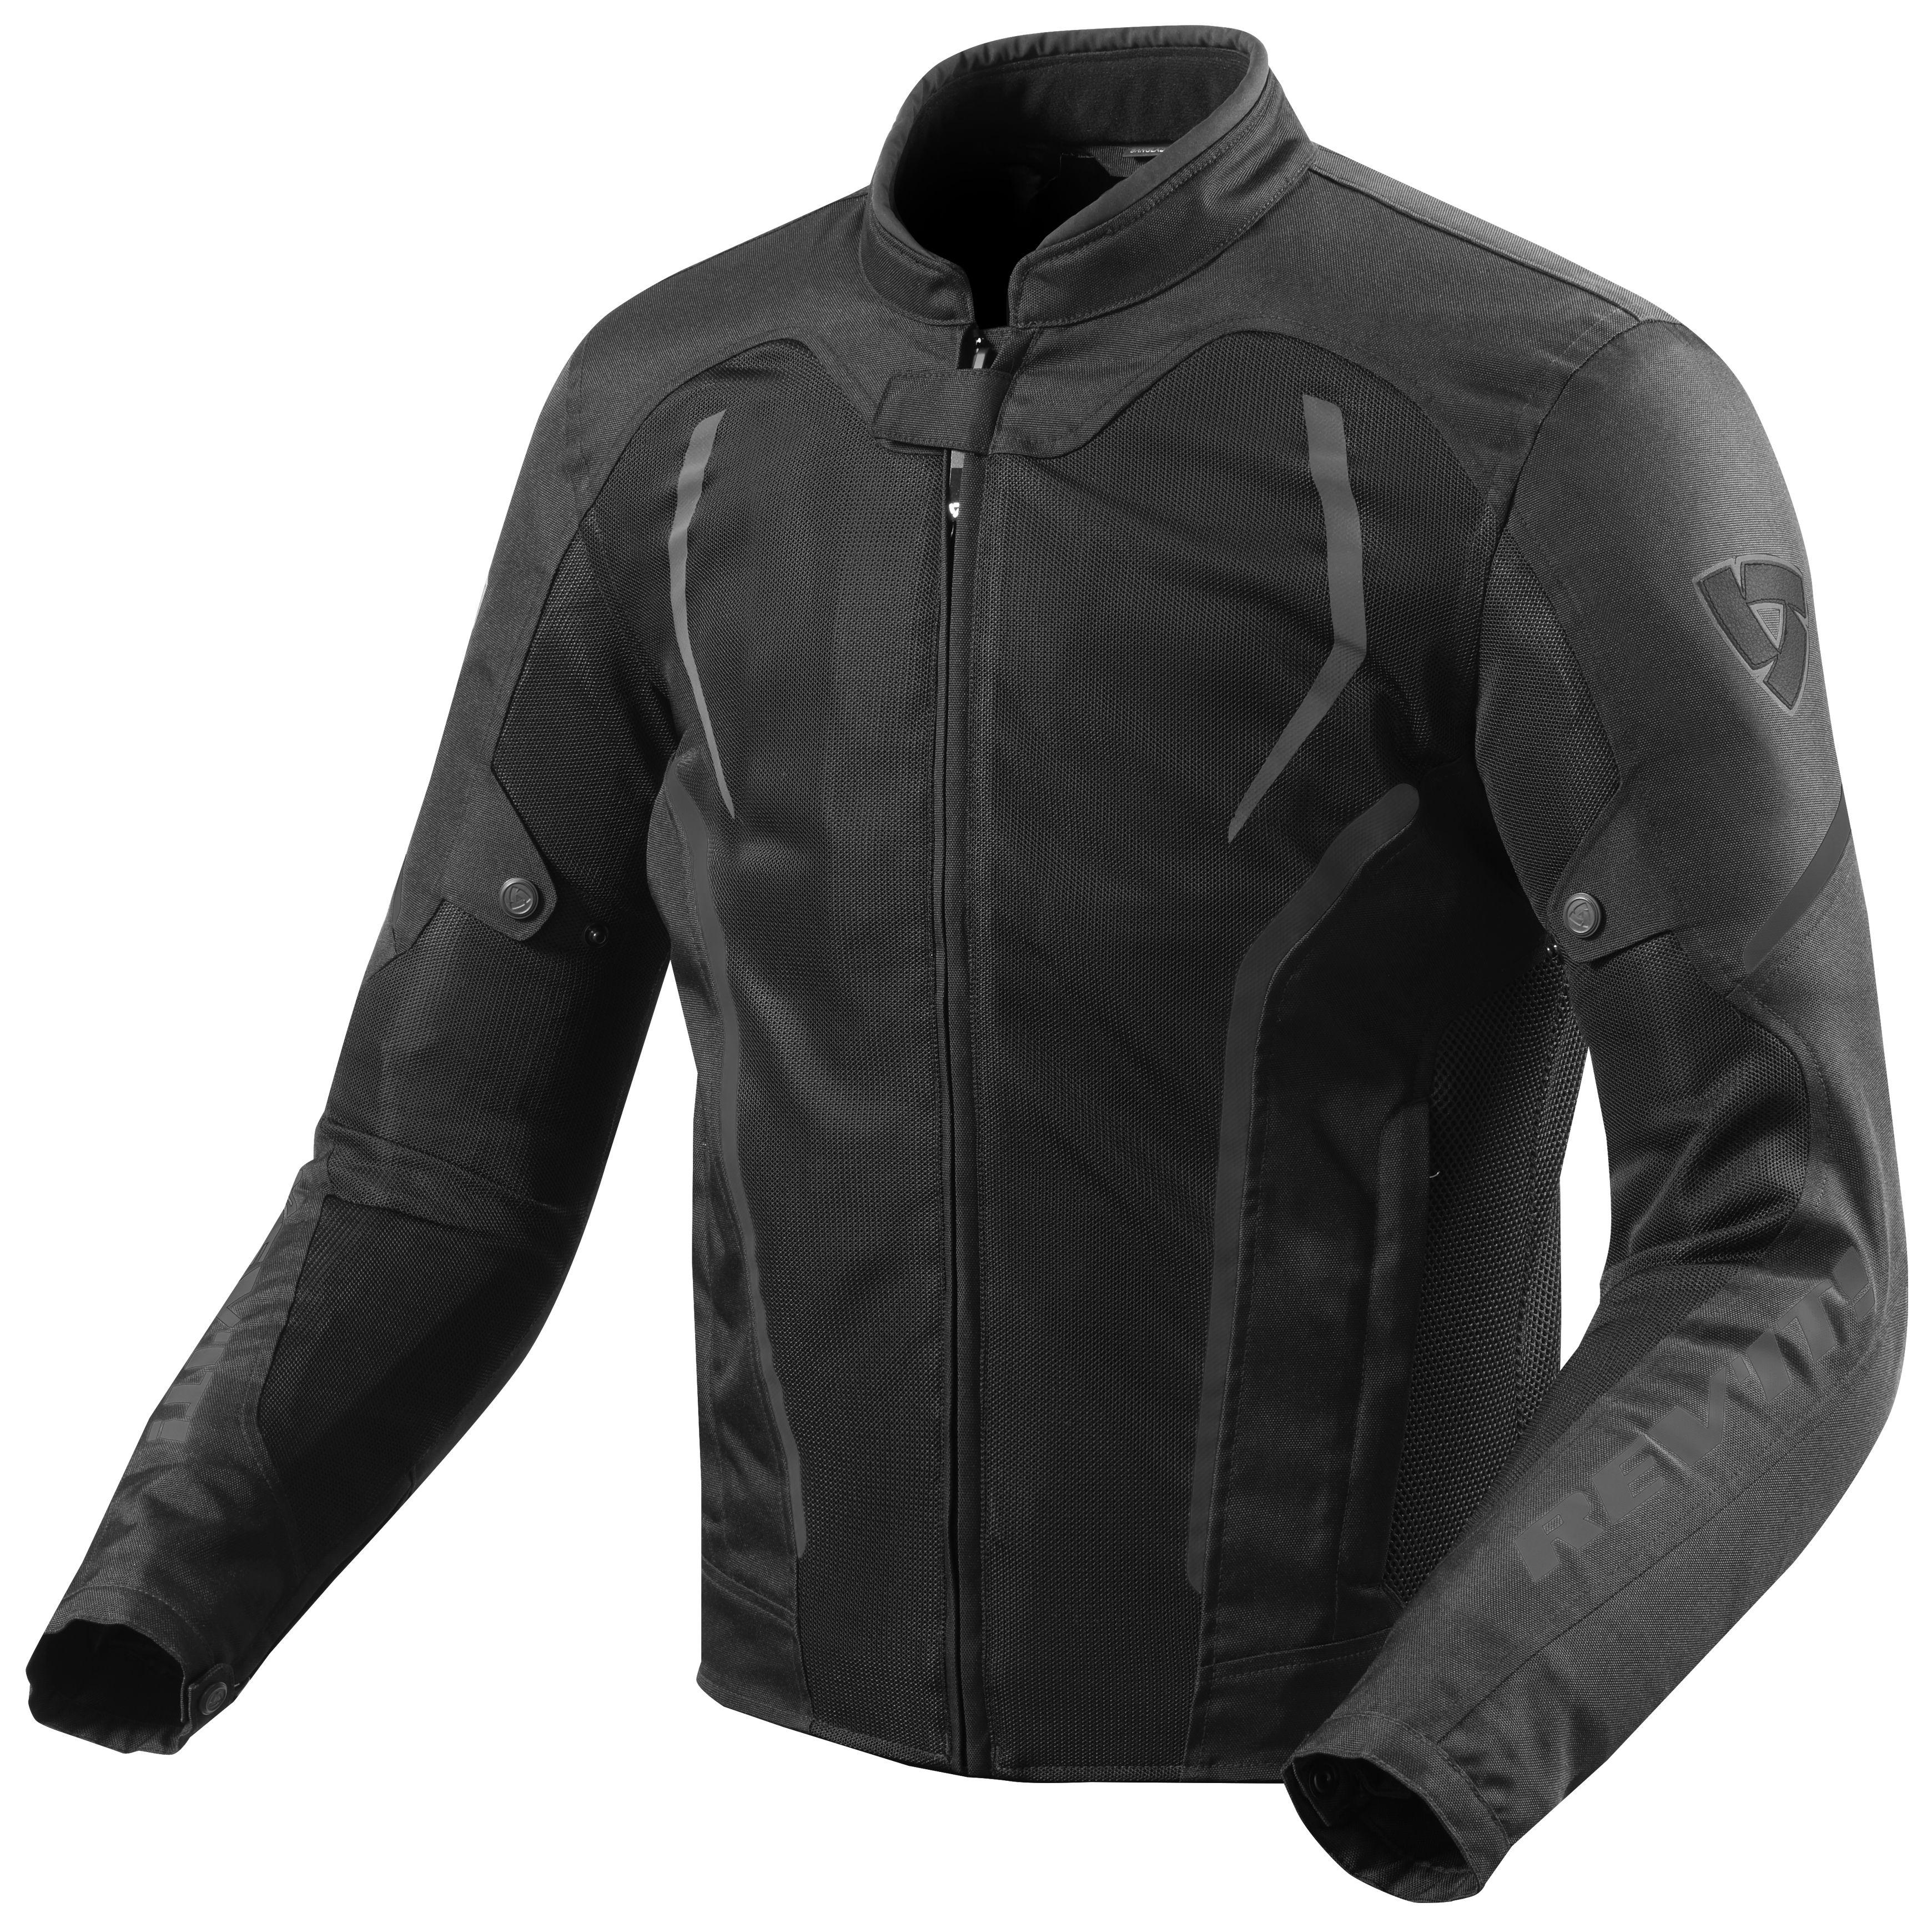 Talla S Color Negro Alpinestars Chaqueta veraniega para Moto Luc Air